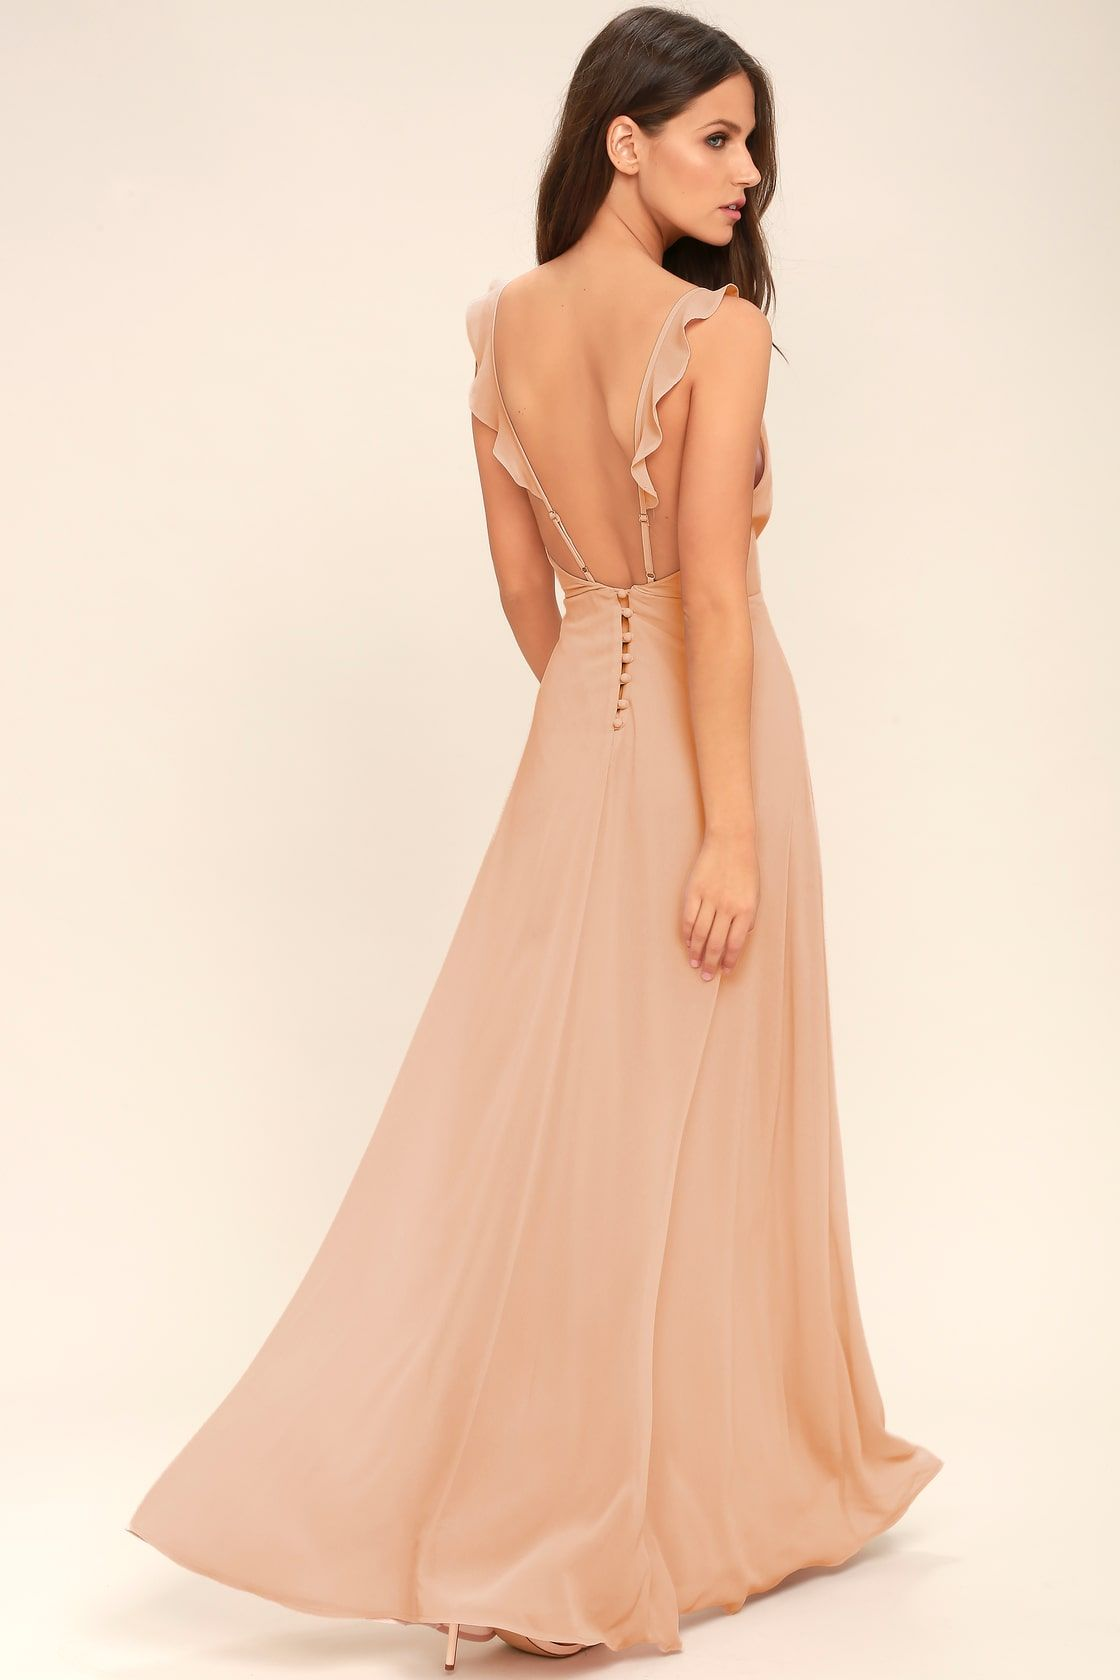 1fcc7c215ec Lovely Blush Maxi Dress - Sleeveless Dress - Bridesmaid Dress. Meteoric  Rise Blush Maxi Dress Pink Formal Dresses ...